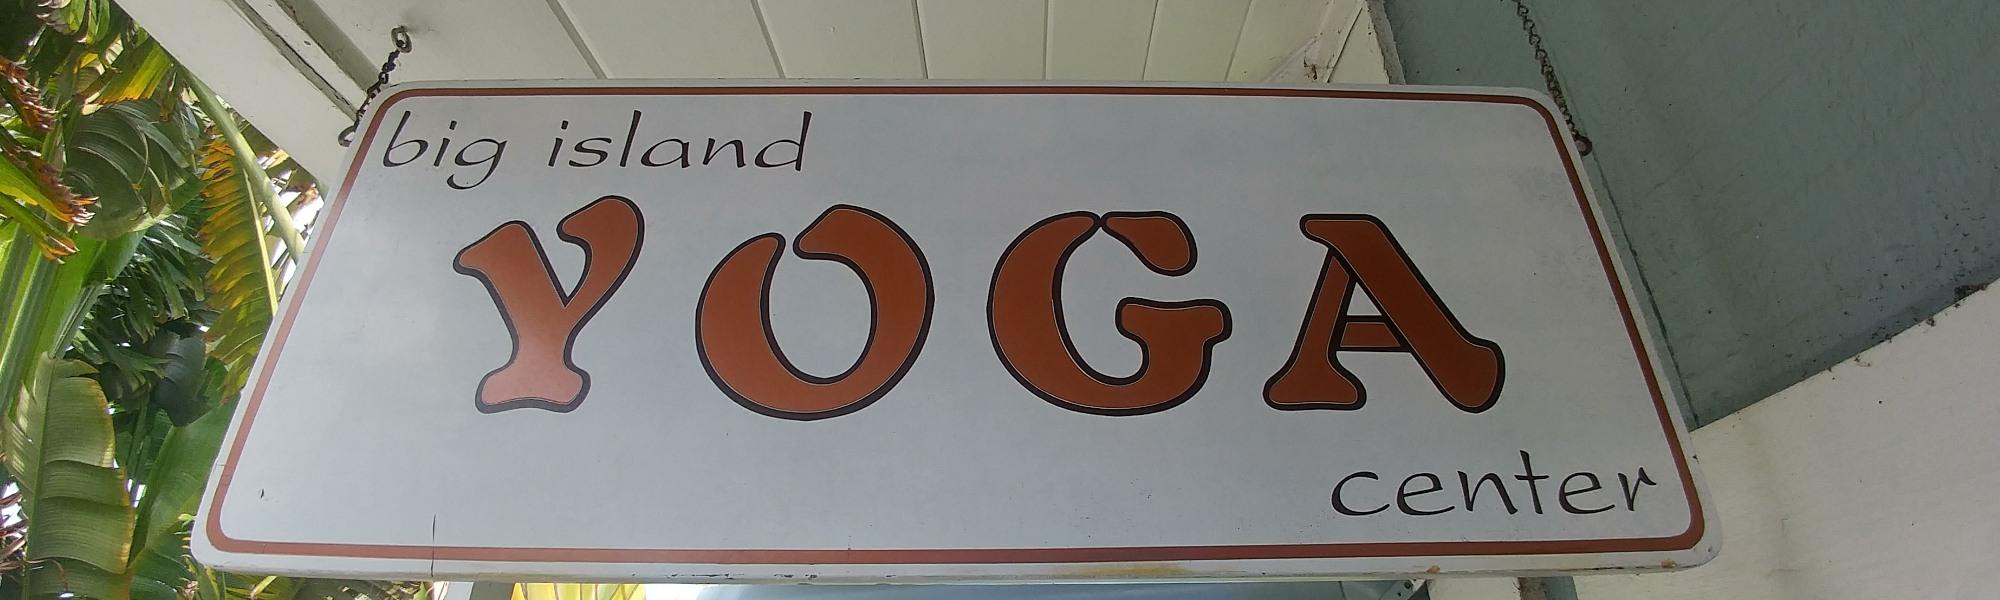 www.bigislandyoga.com